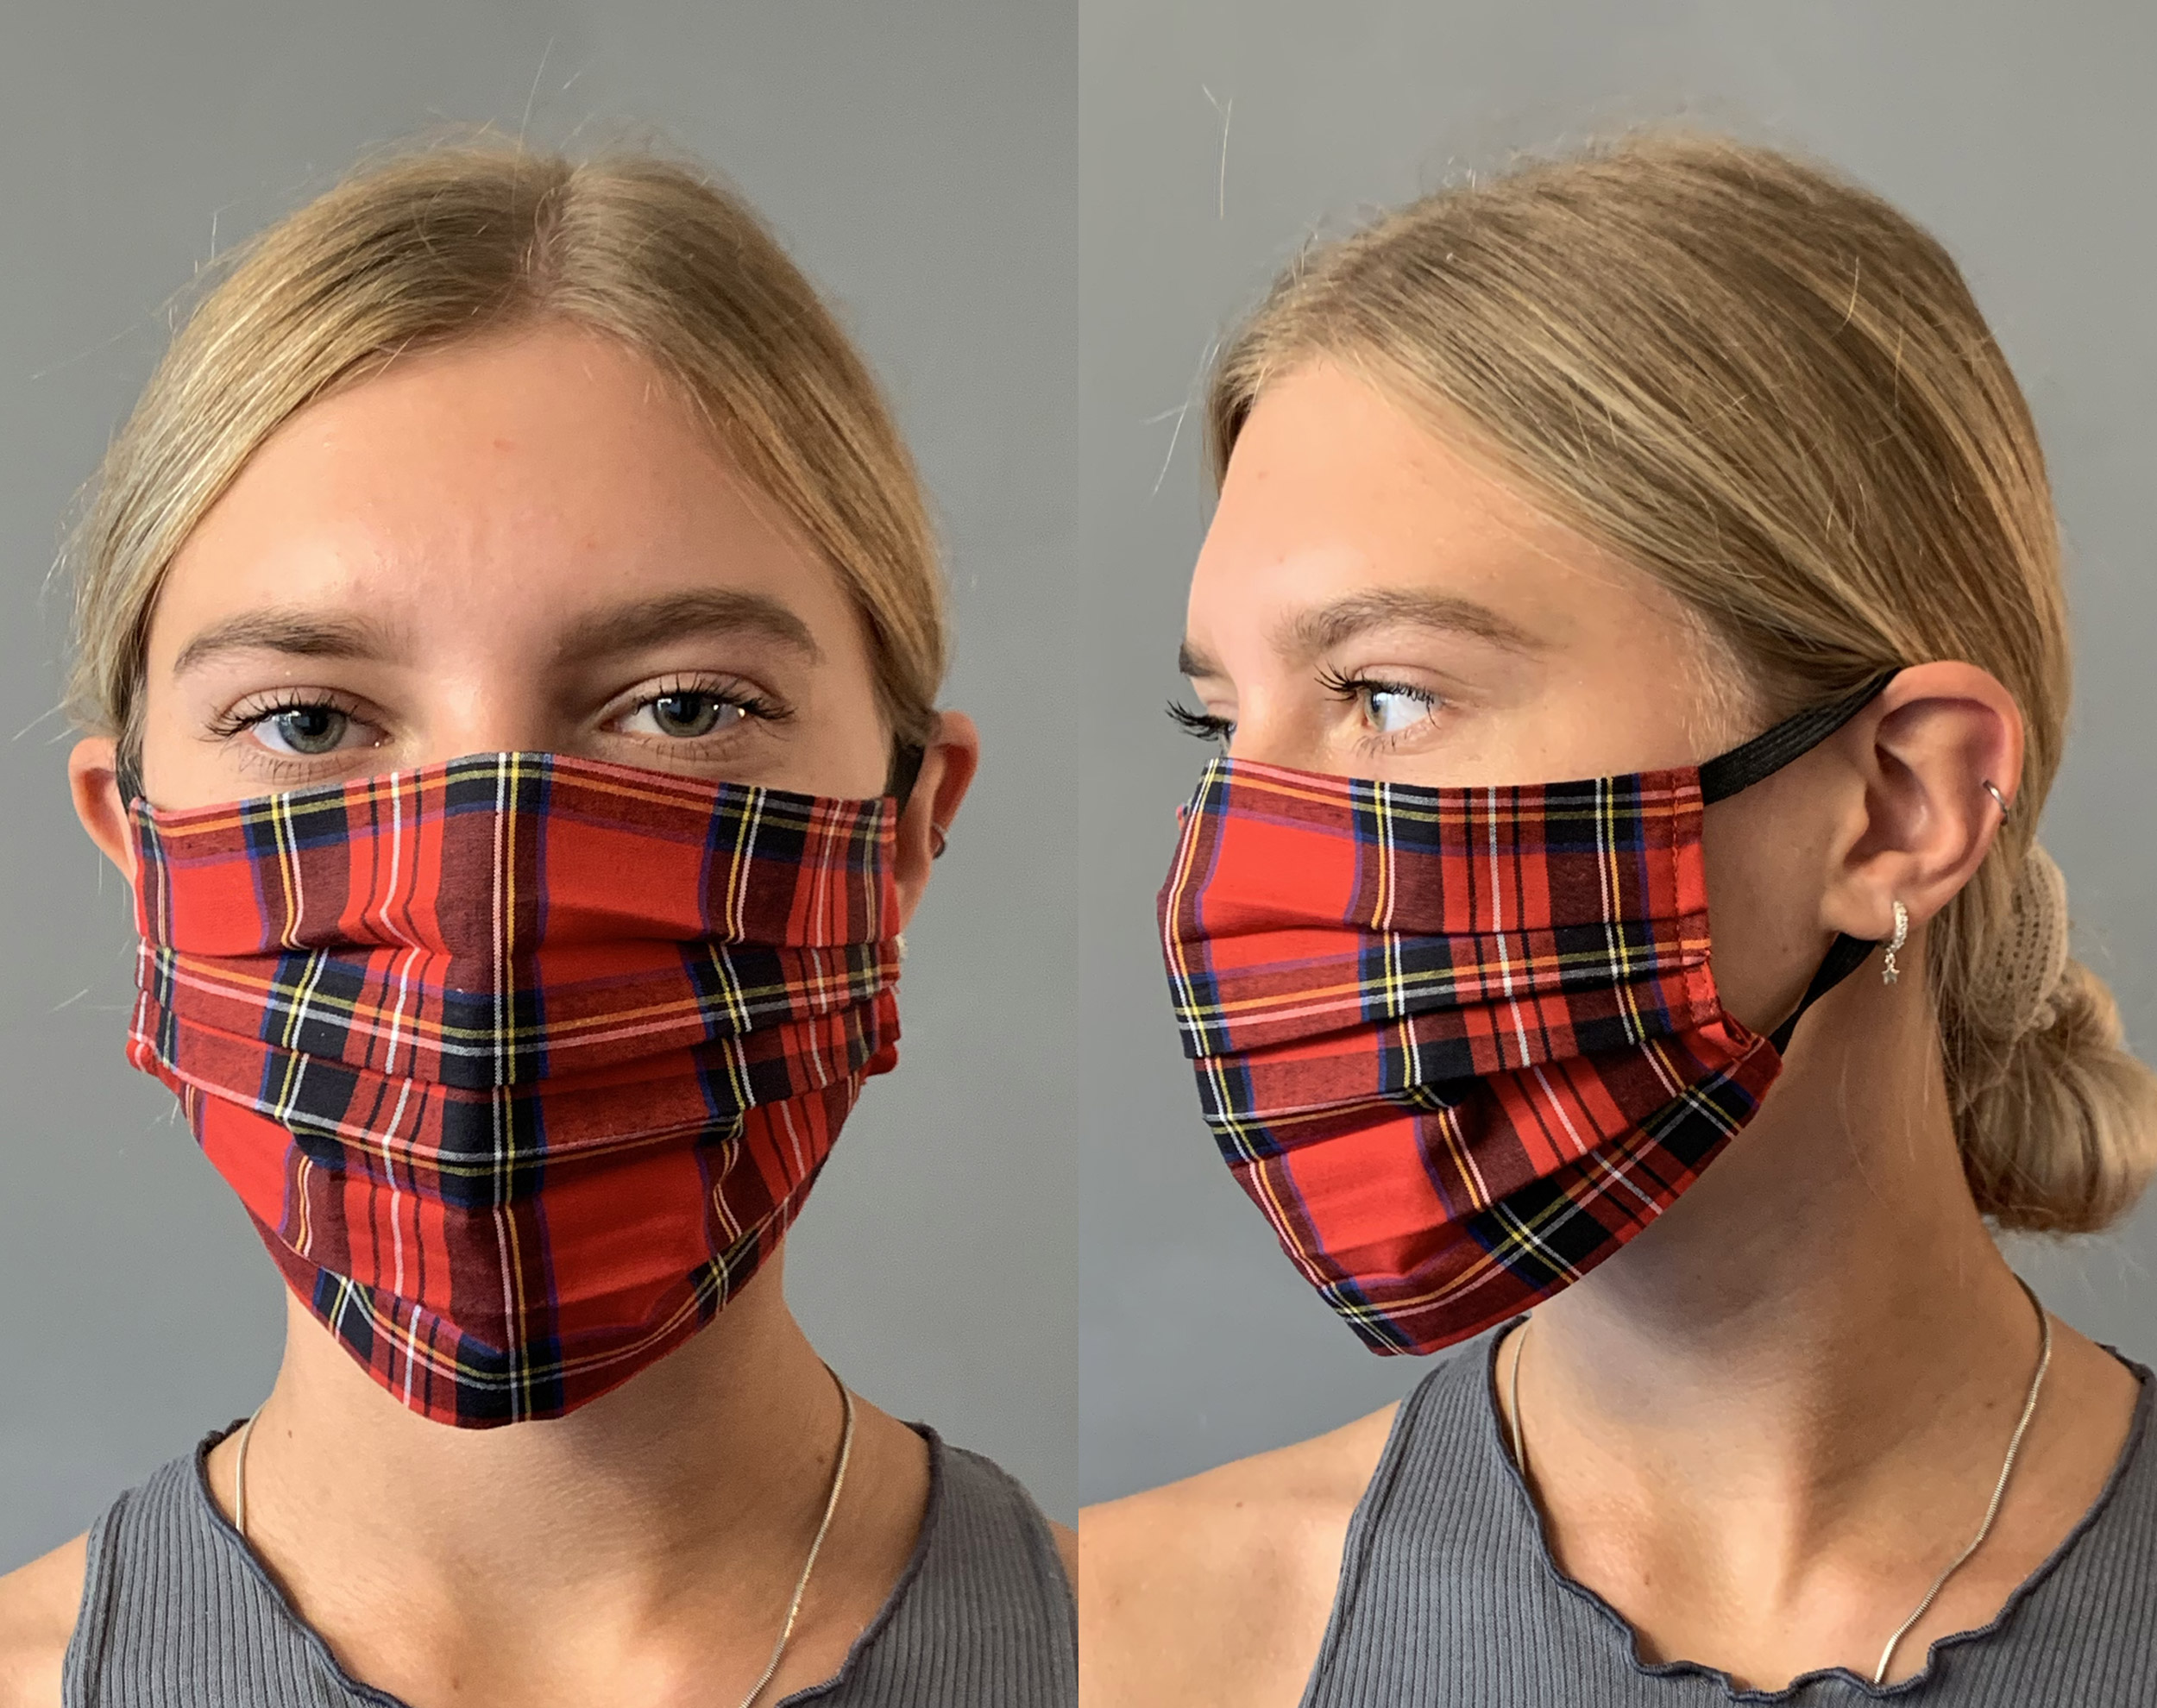 Tartan Face Mask Covering